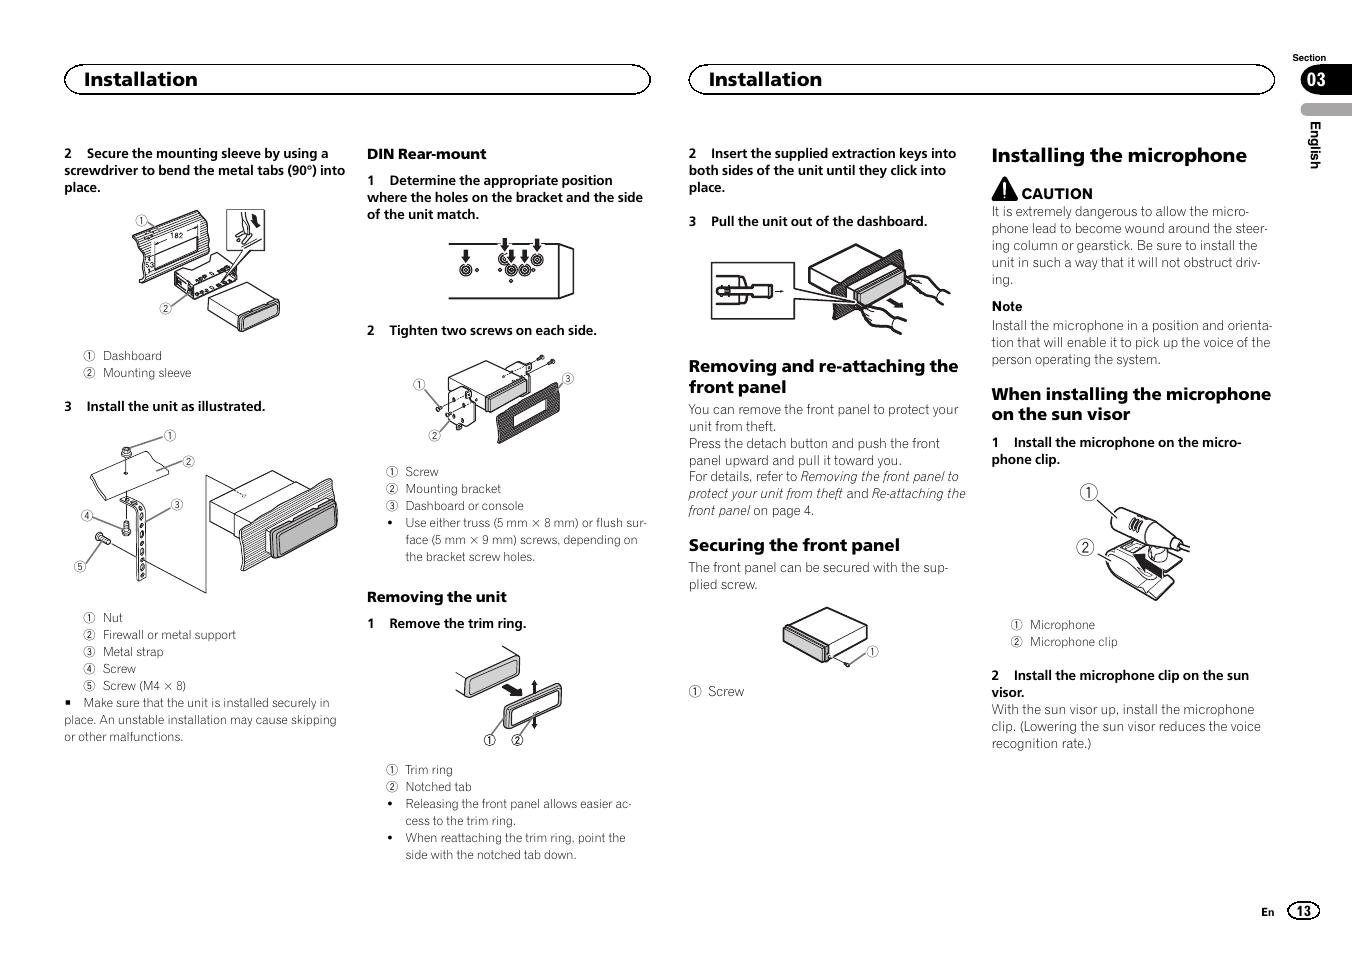 Fein Schaltplan Des Lüfterzentrumsrelais Ideen - Elektrische ...